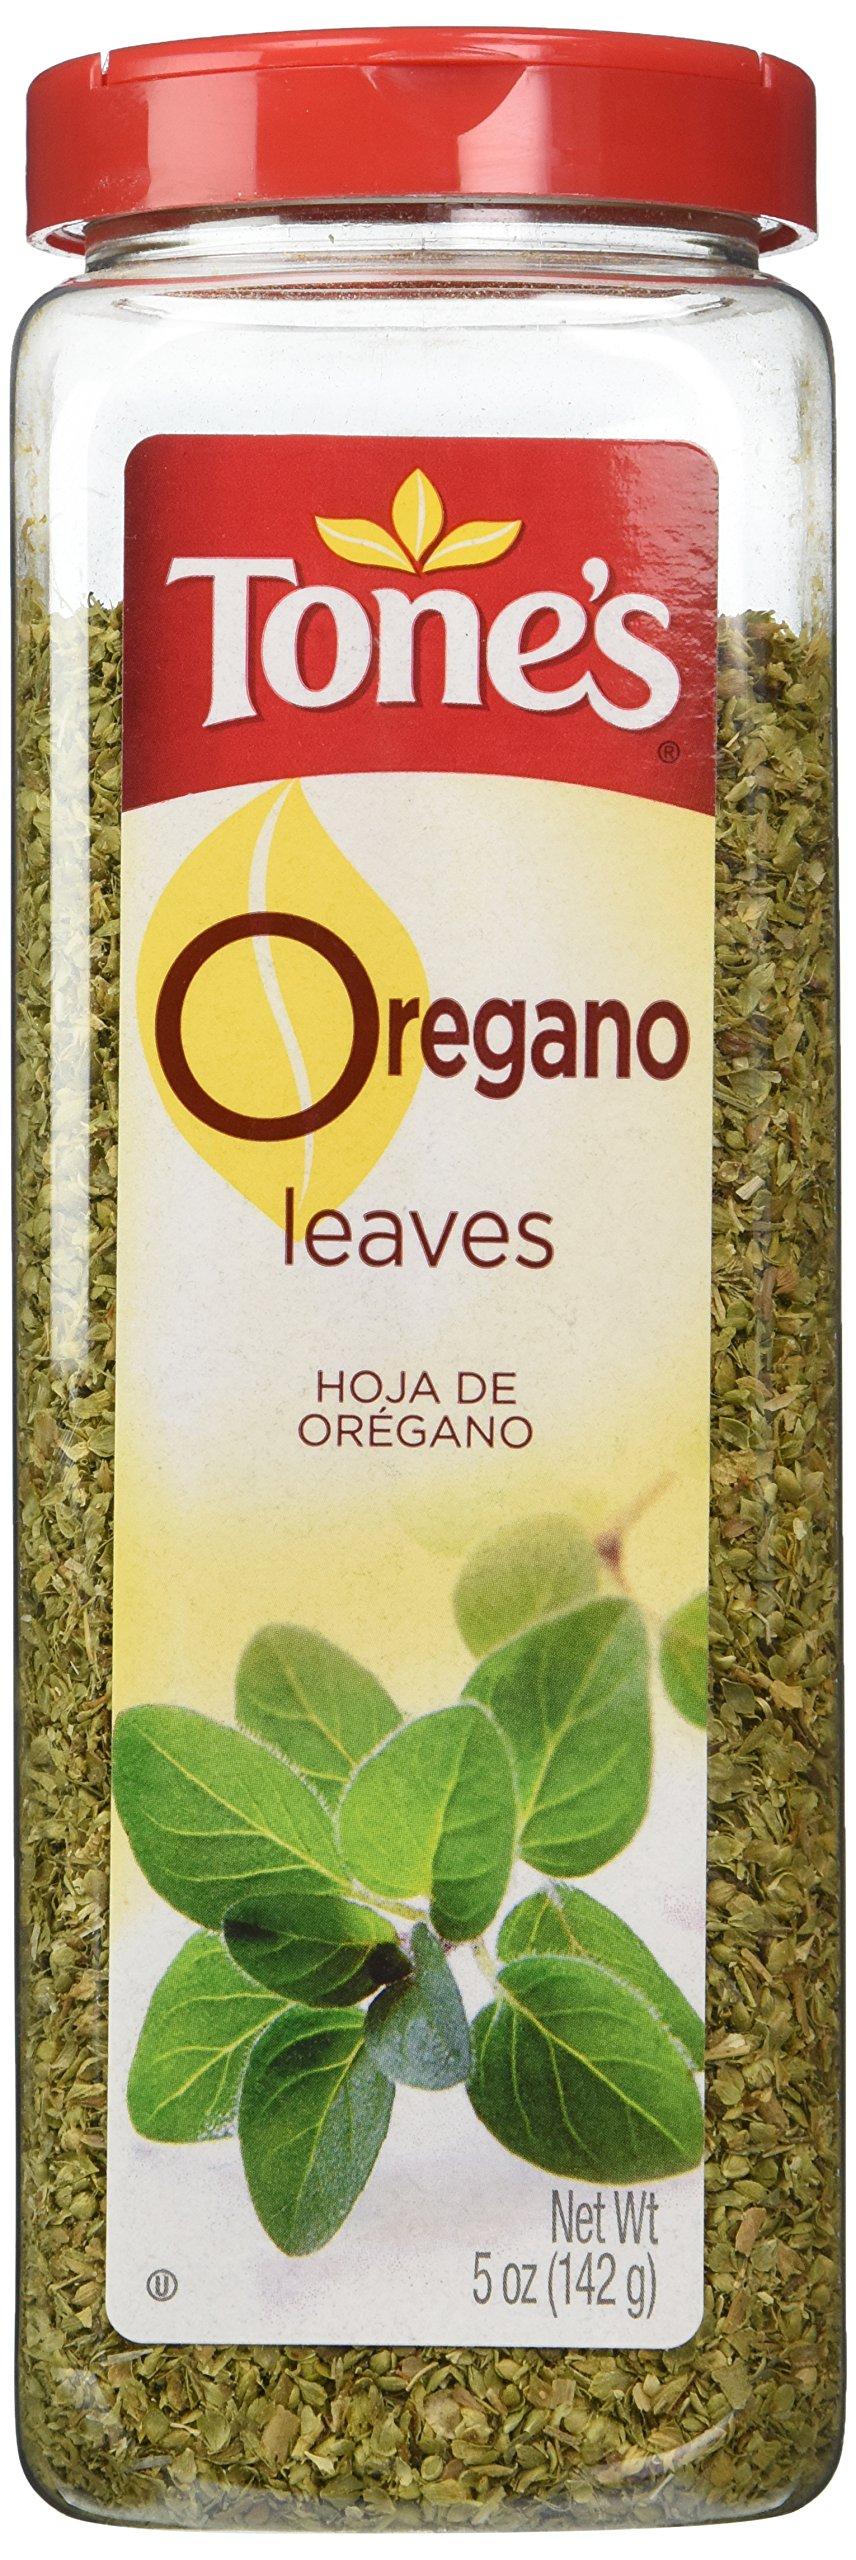 Member's Mark Oregano Leaves by Tone's, 5 Ounce